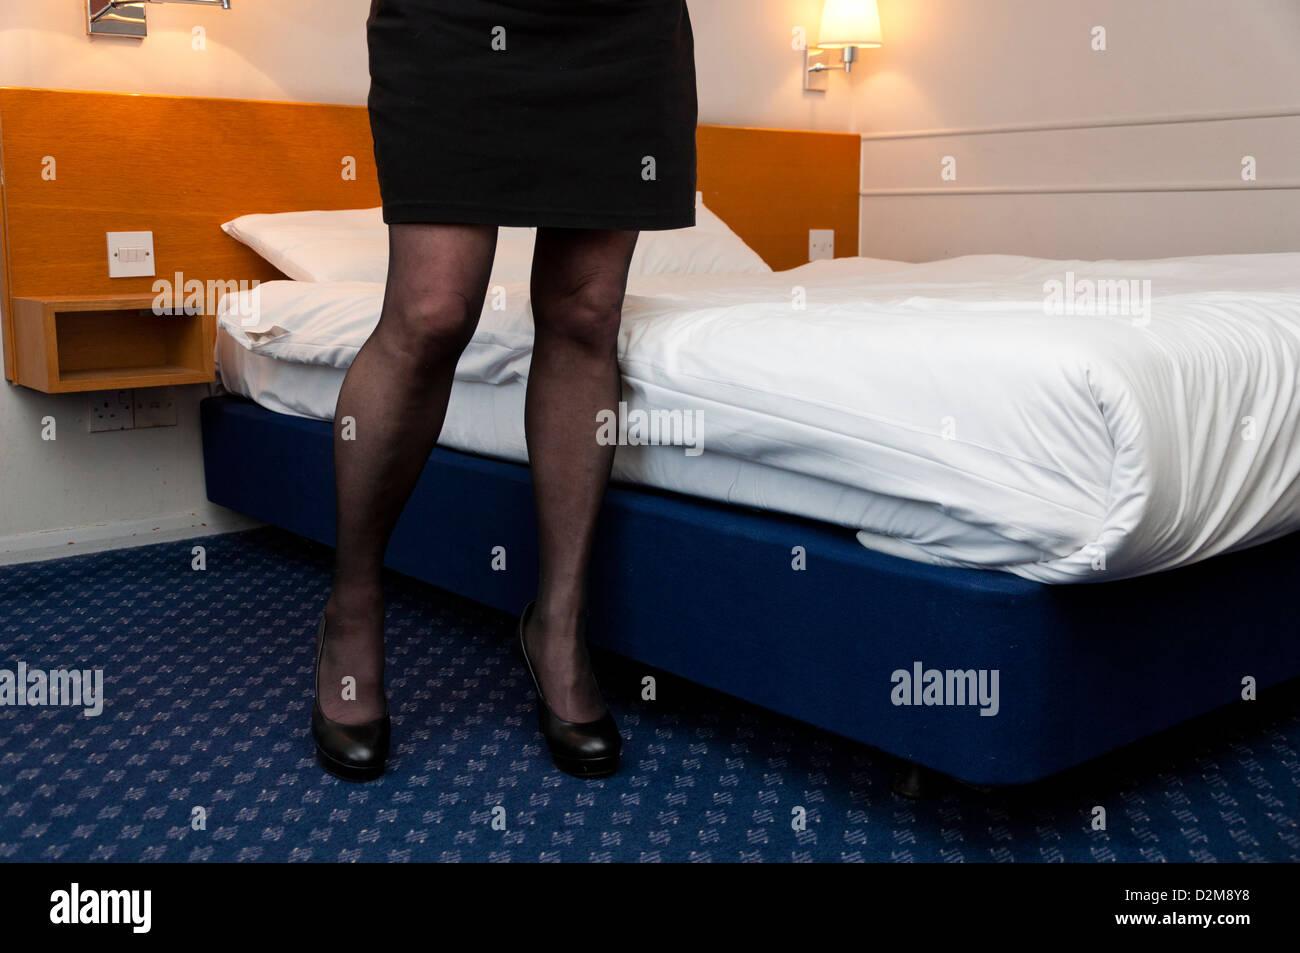 stockings hotel